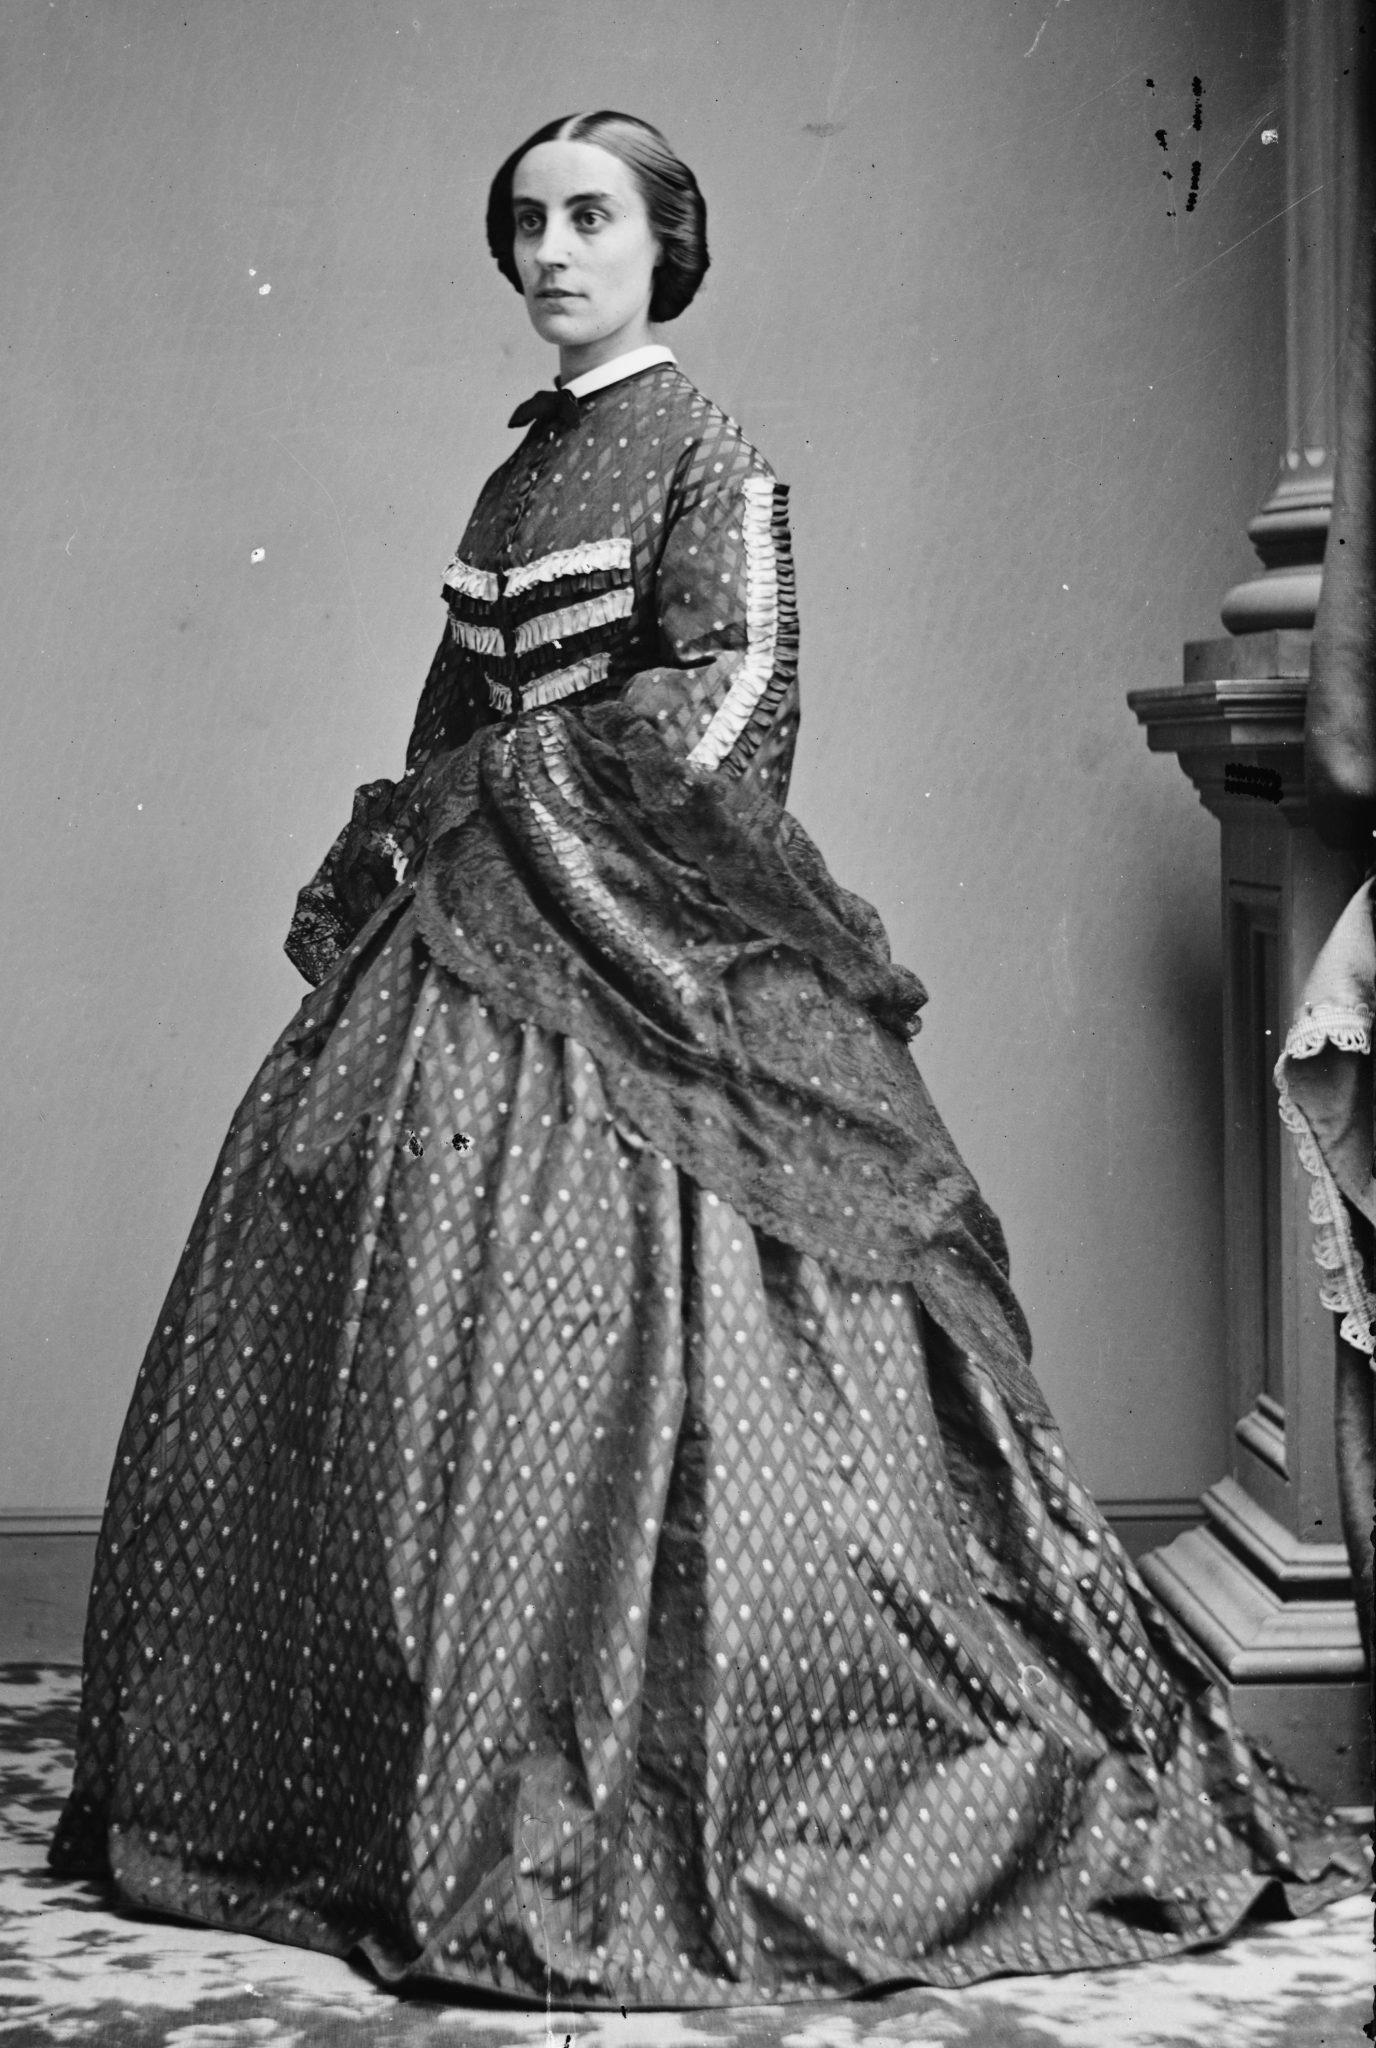 The Legacy of Matthew Brady (1823/4-1896) | Art History Unstuffed